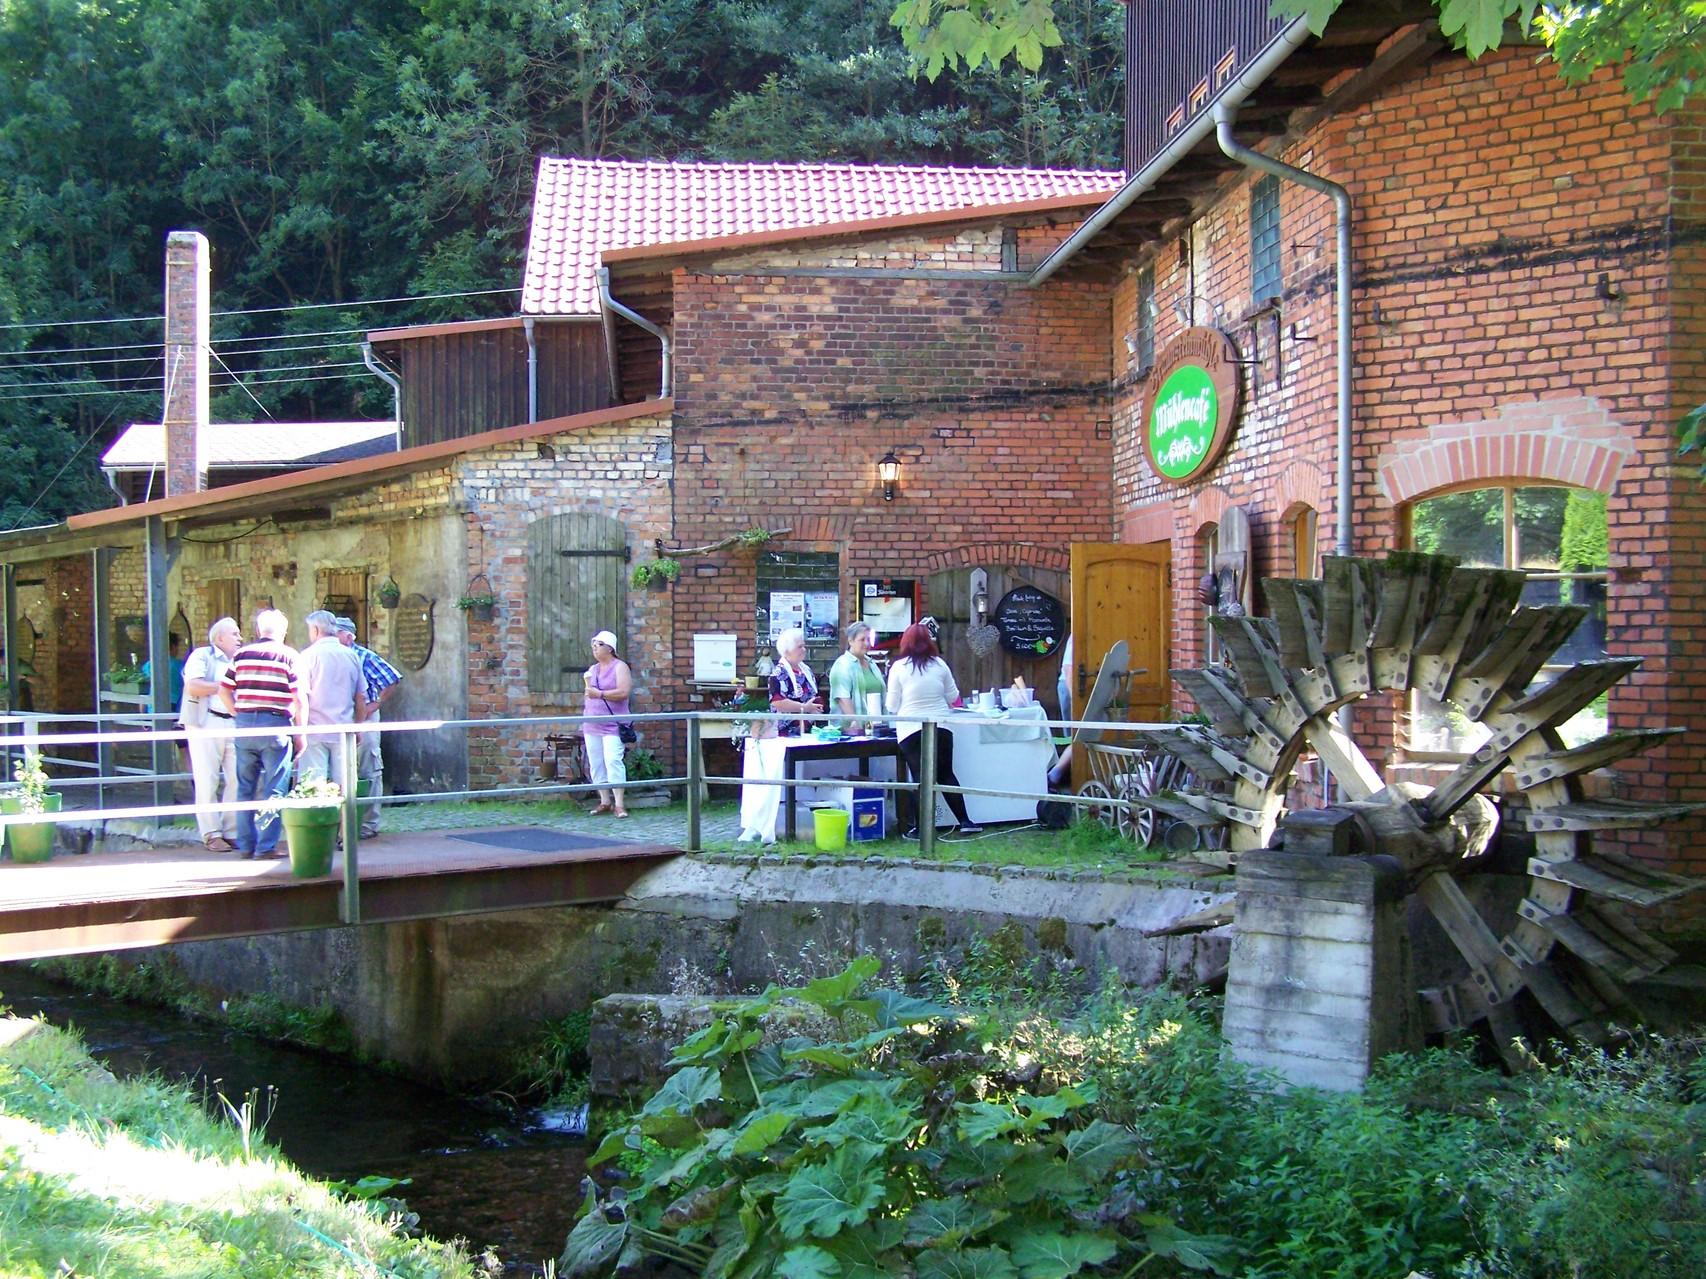 Zahme Geratal, Braunsteinmühle Mühlencafé